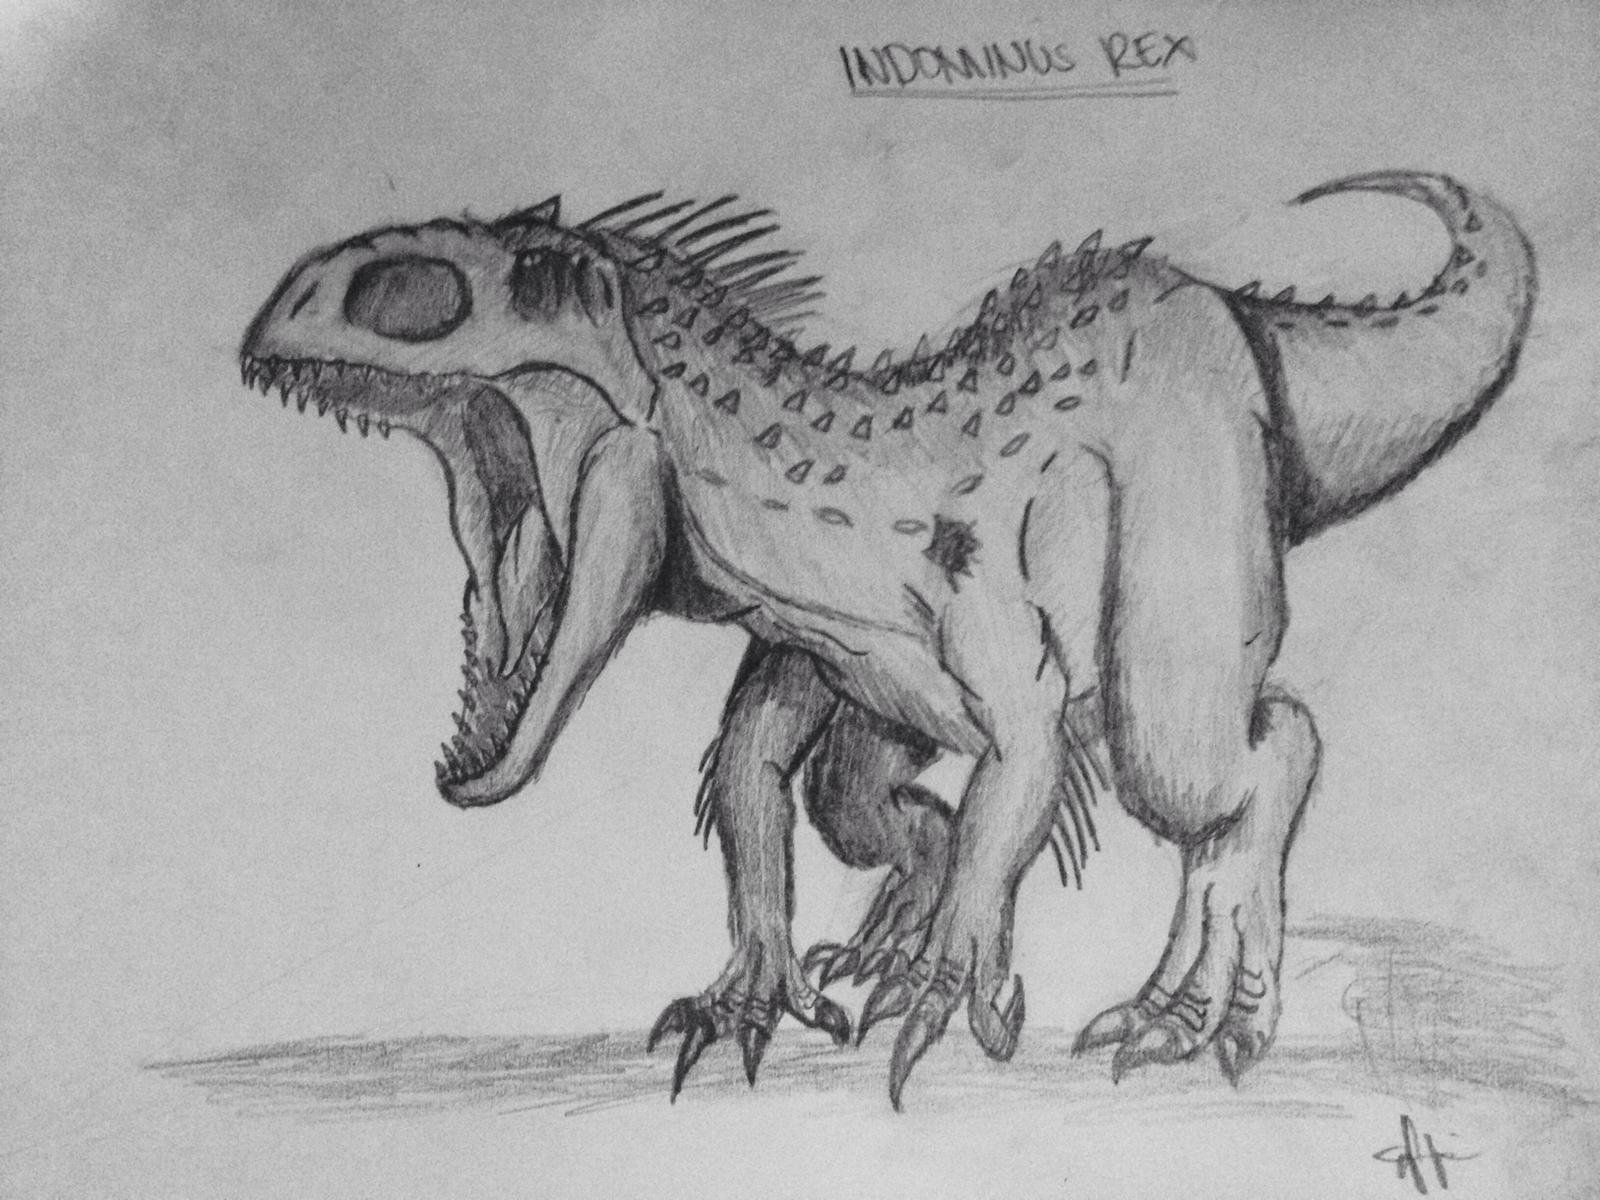 indominus rex by tyrant33 on deviantart